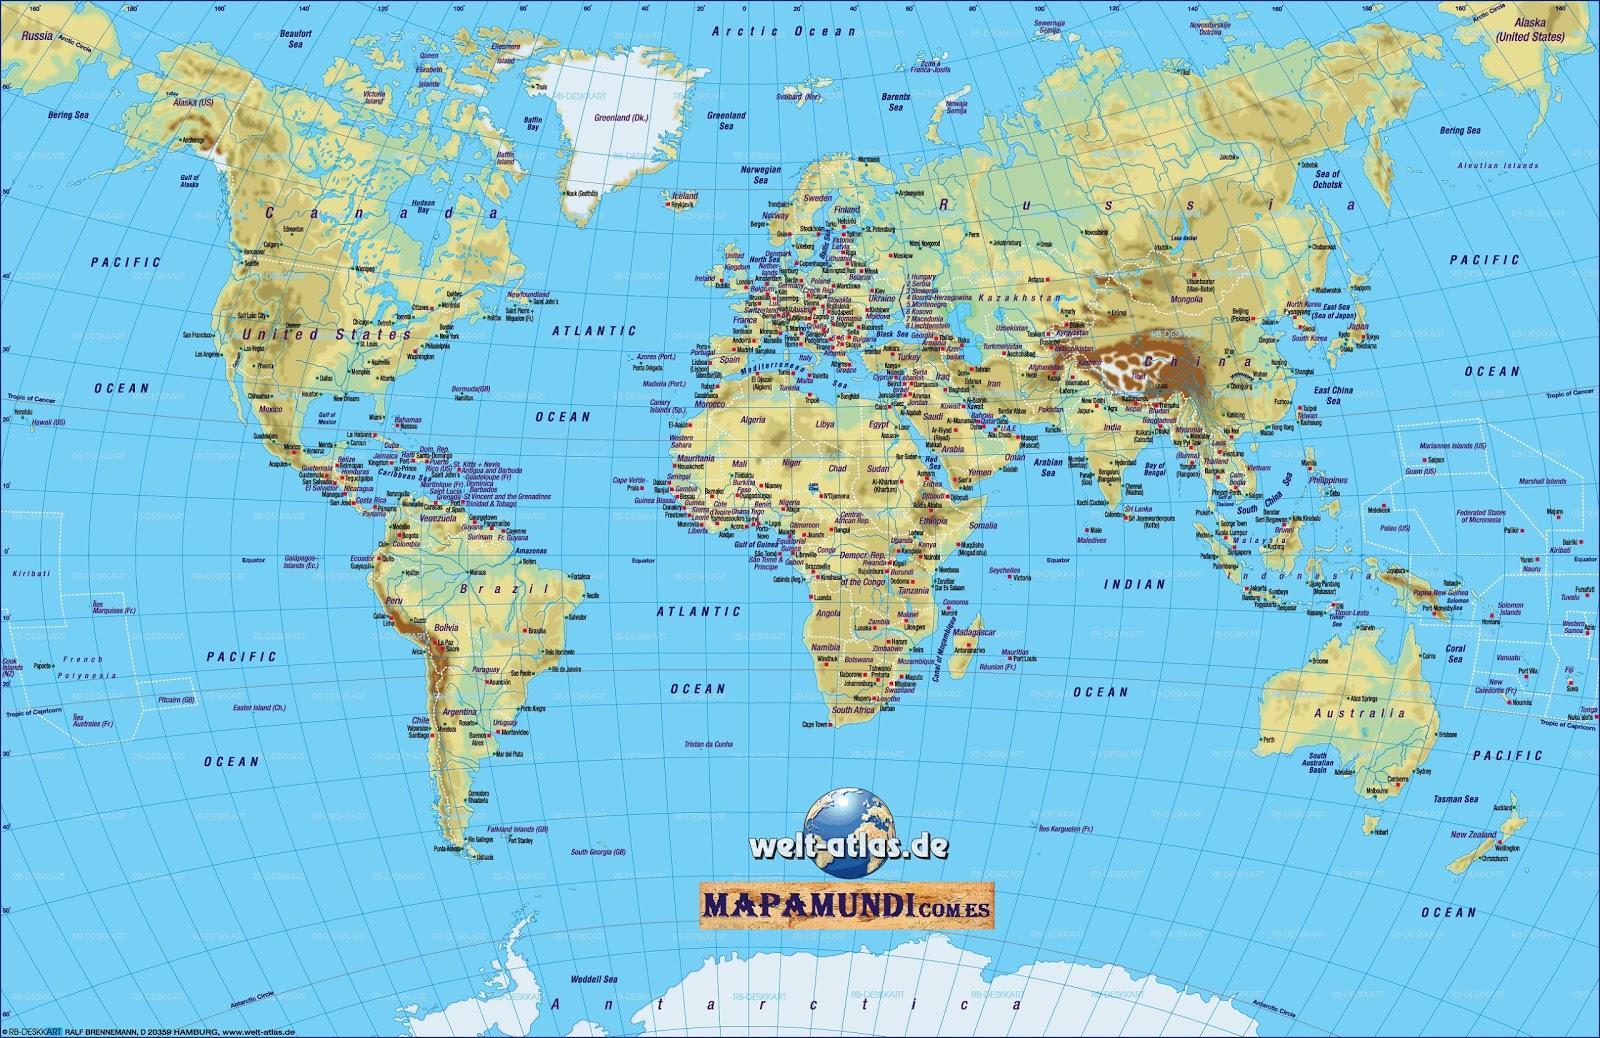 Mapamundi | Mapa del mundo fisico